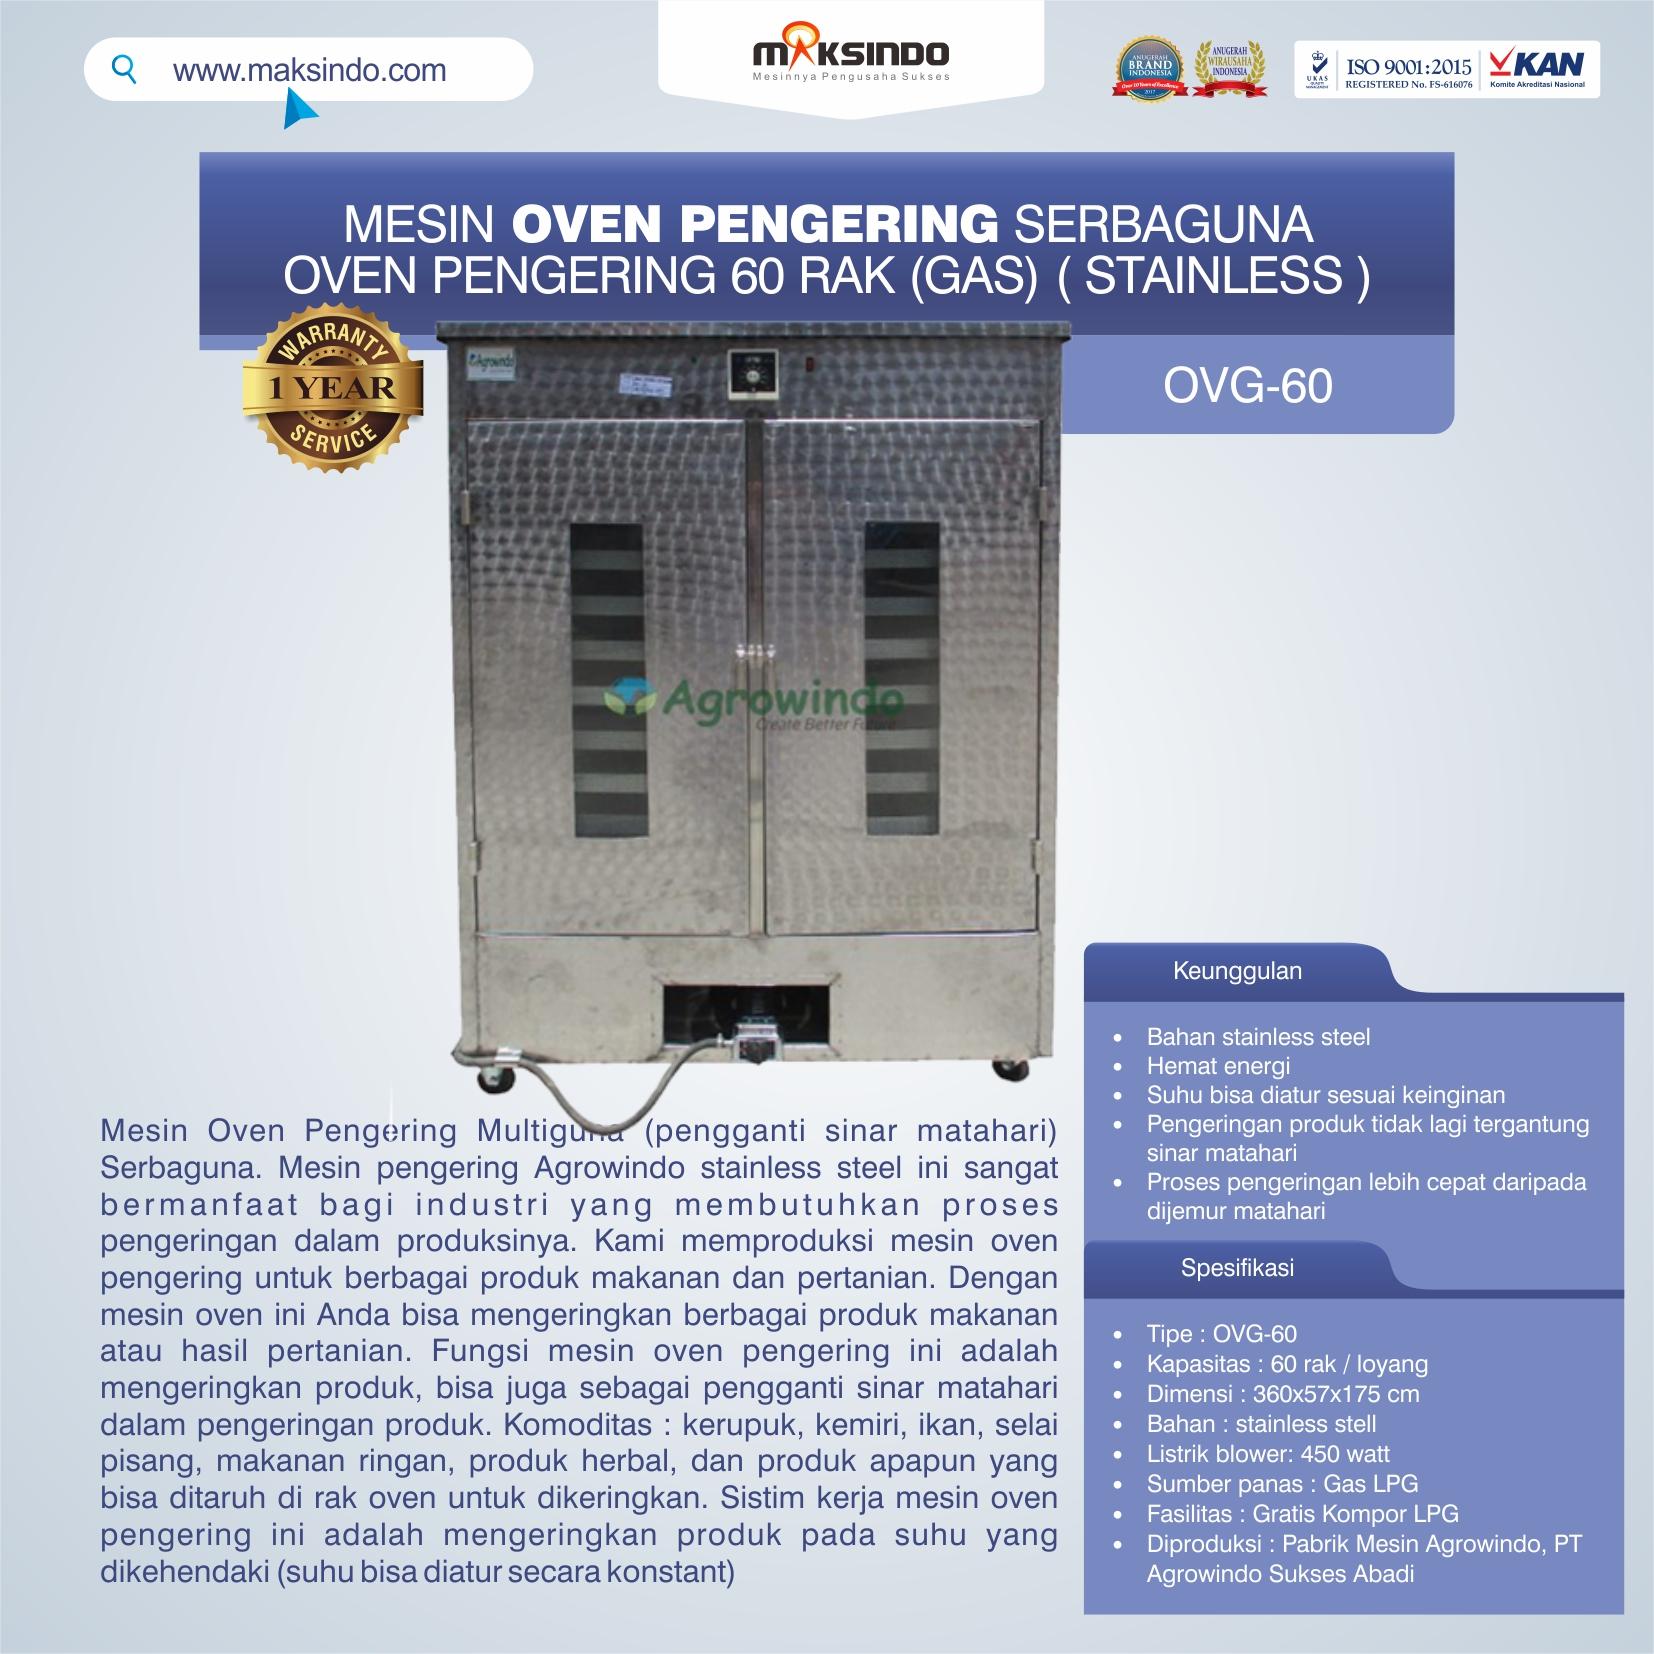 OVG-60 Mesin Oven Pengering Serbaguna 60 Rak (Gas) (Stainless )